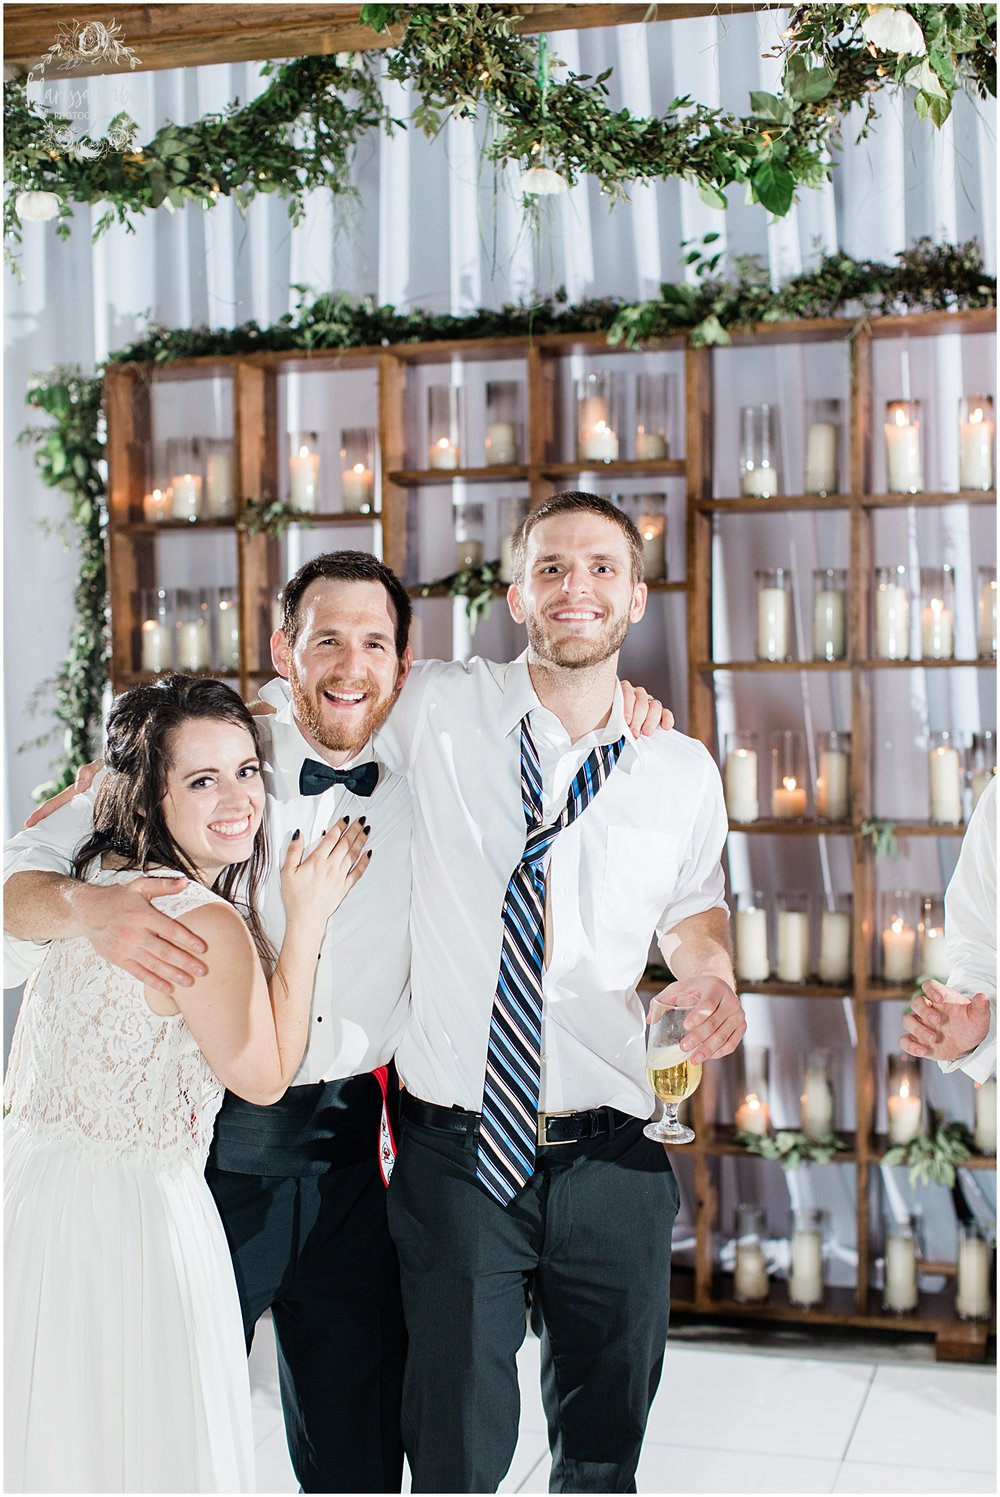 GORBY WEDDING | MARISSA CRIBBS PHOTOGRAPHY_5145.jpg